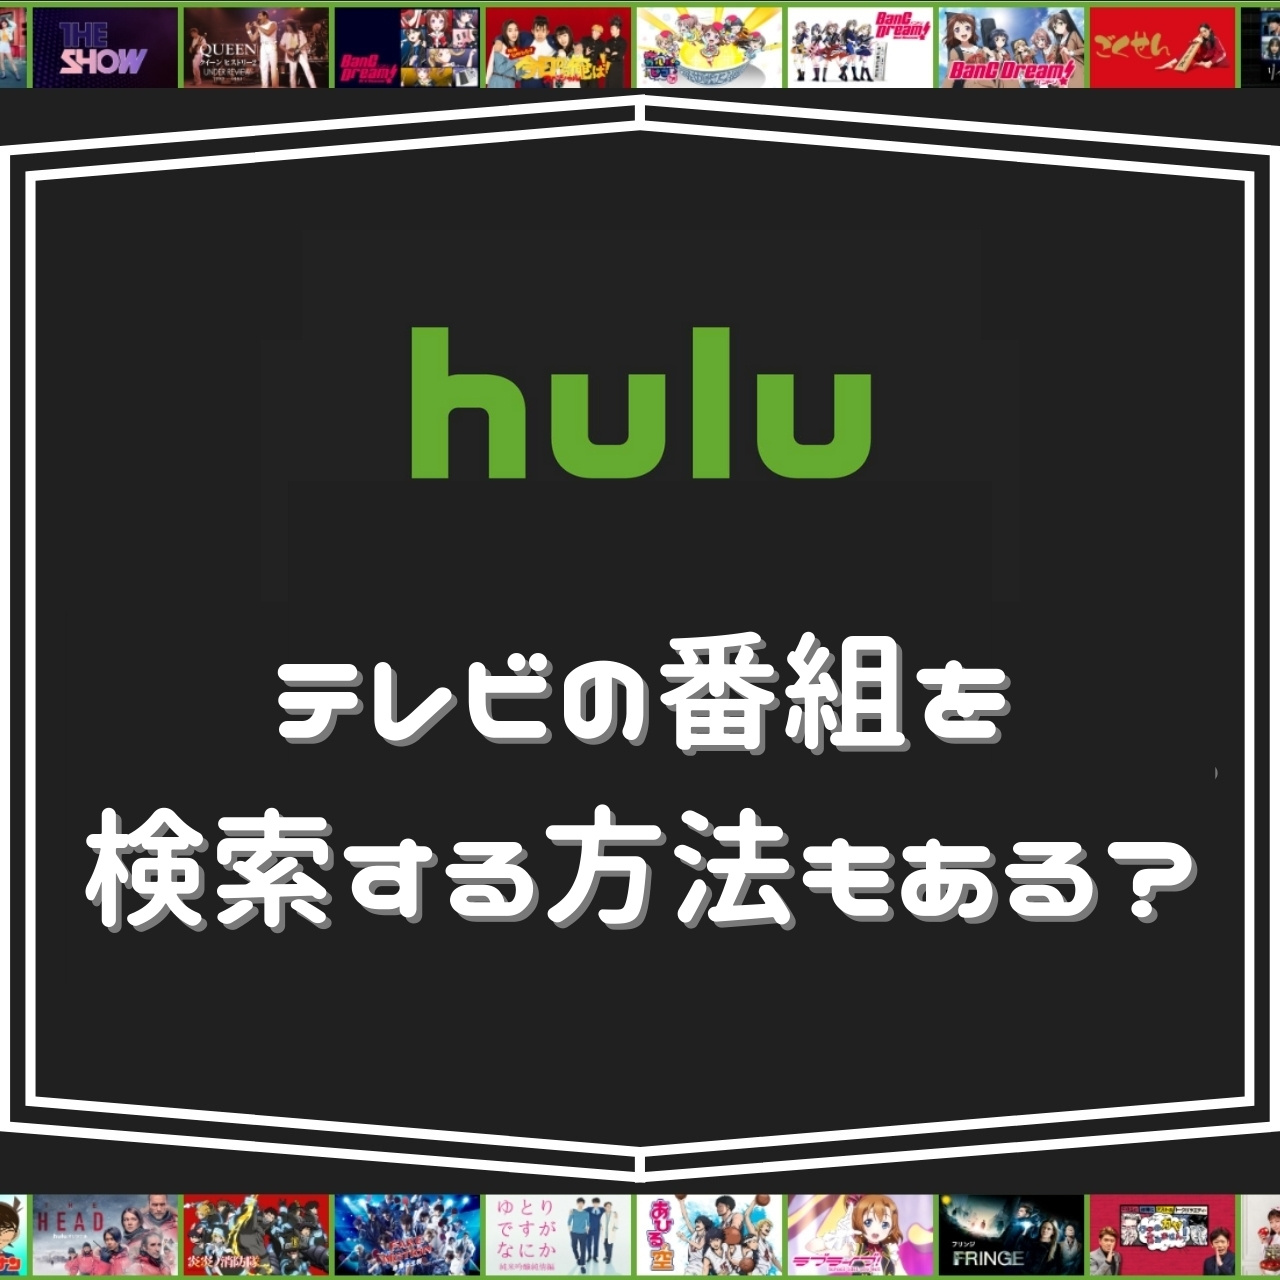 huluではテレビの番組を検索する方法もある?